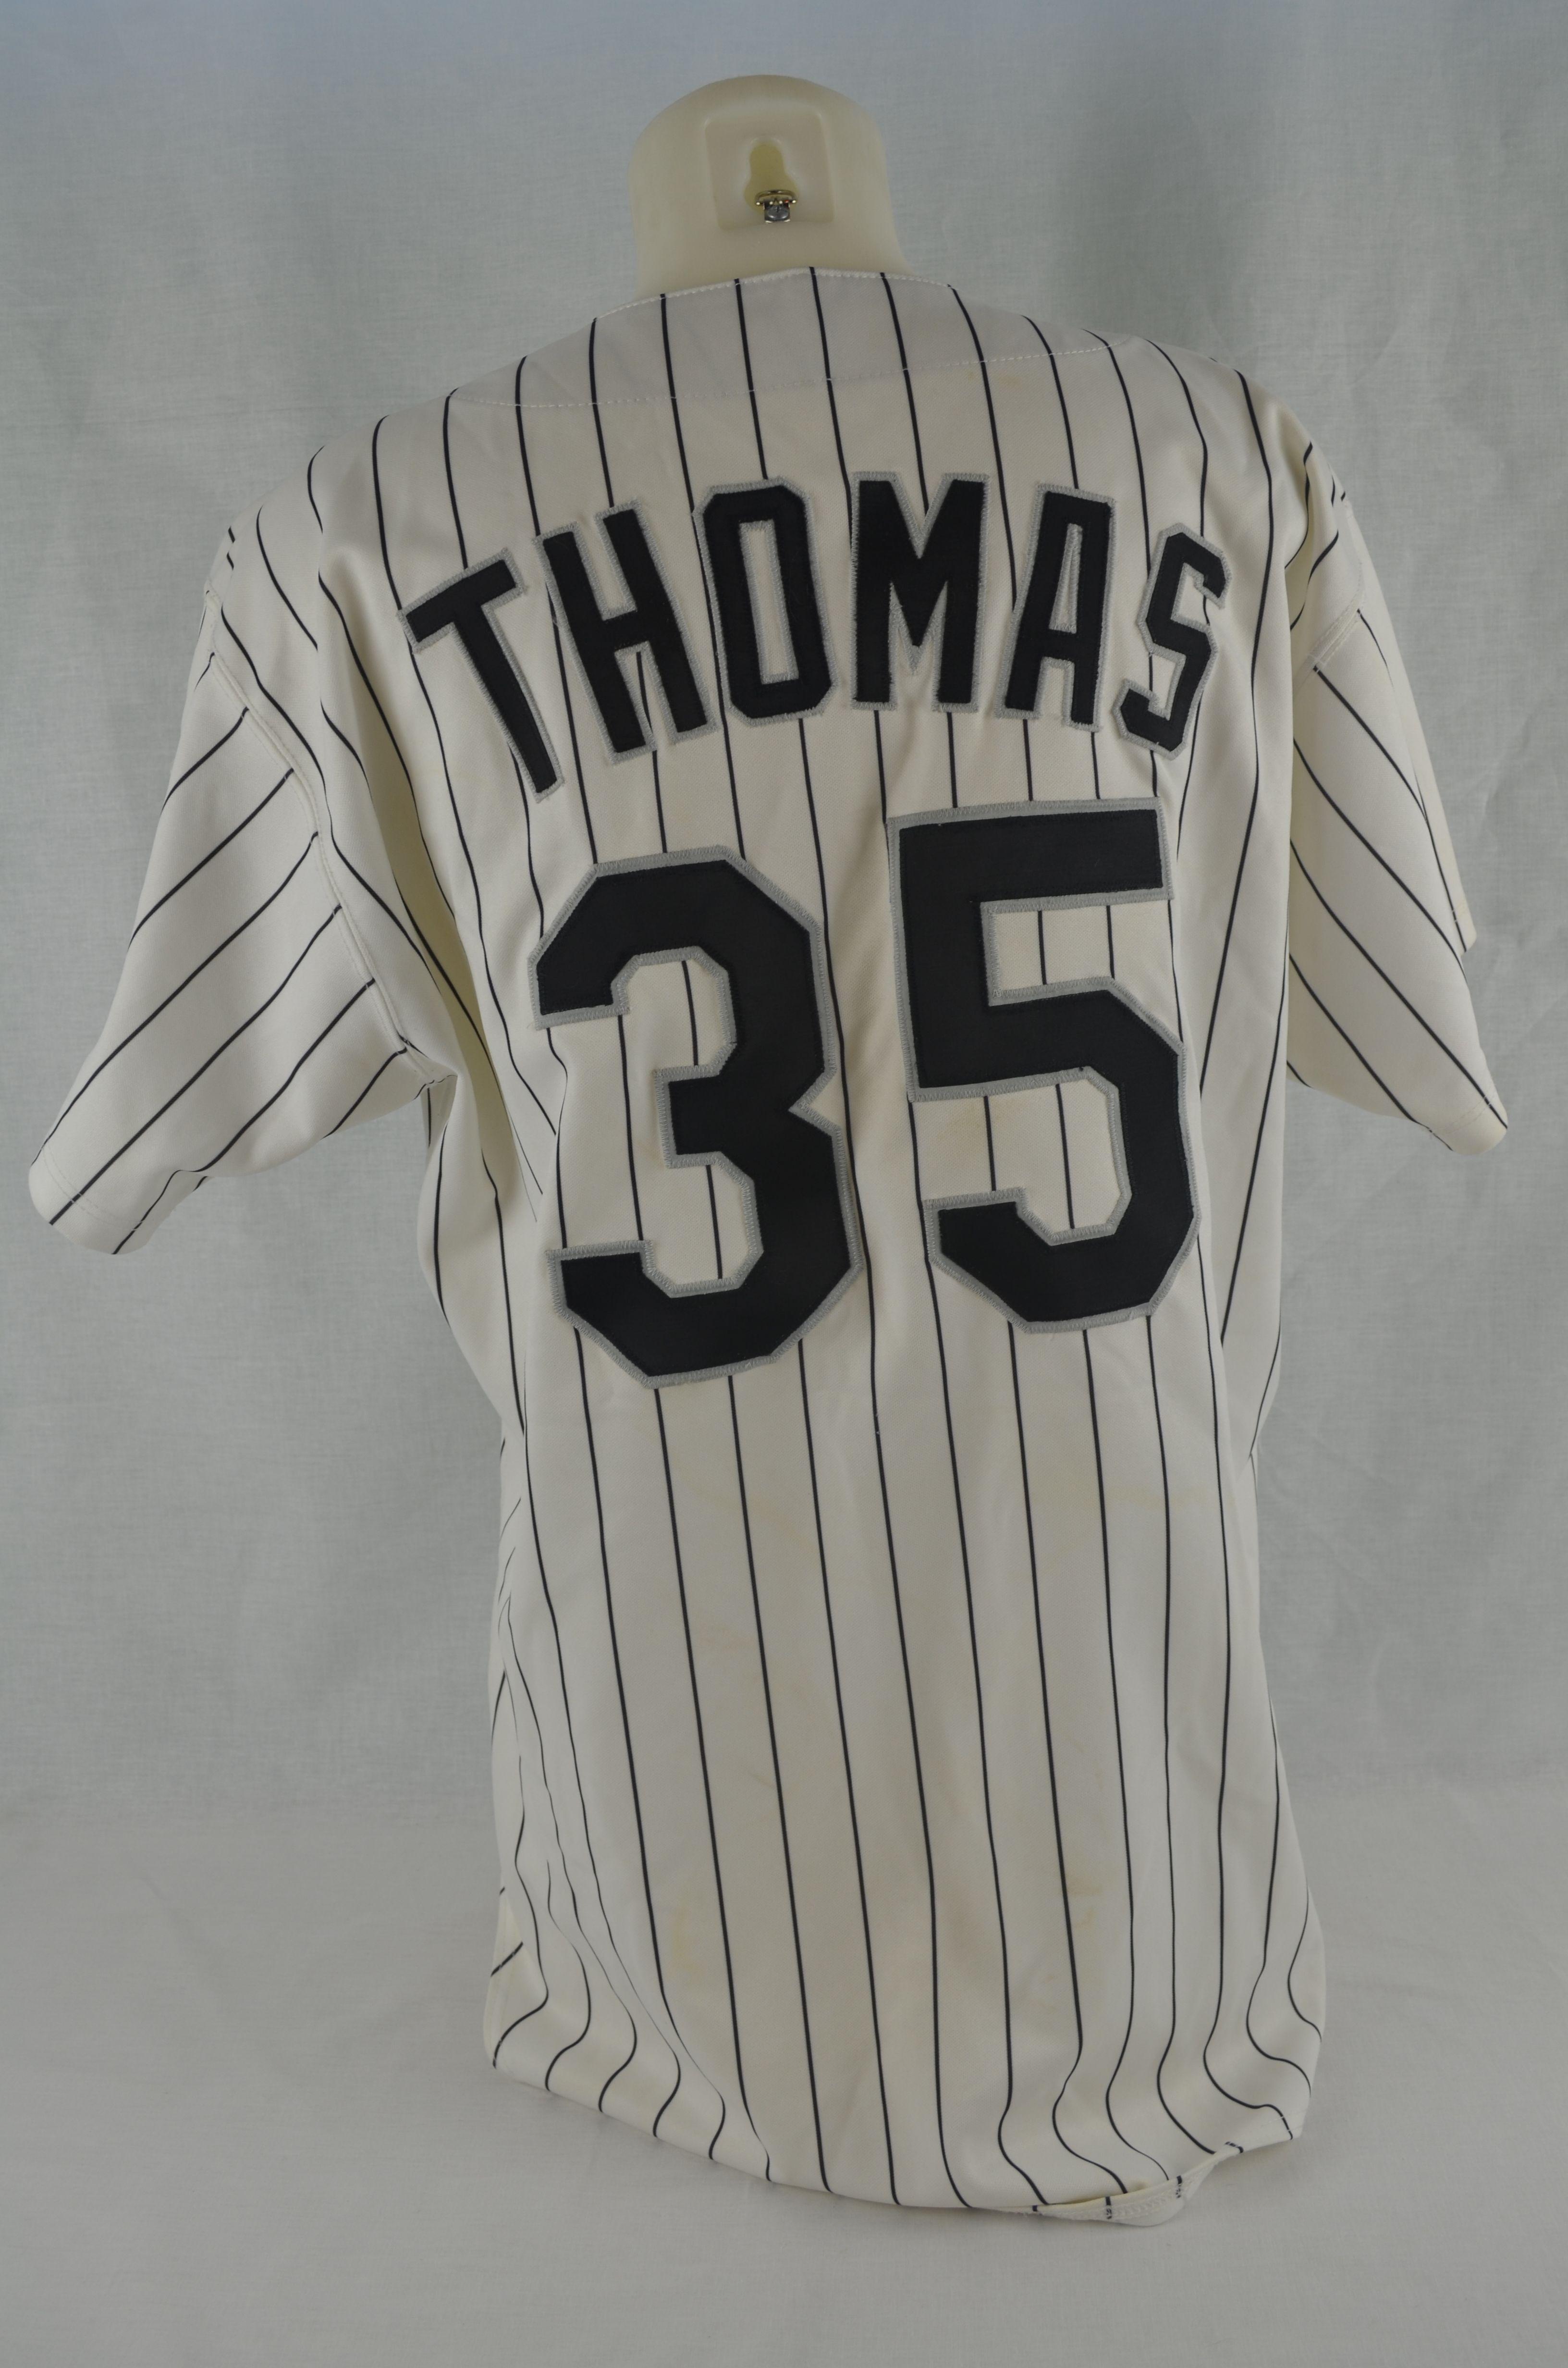 9671e200ff5 Frank Thomas 1998 Chicago White Sox Professional Model Jersey w Medium Use  ...